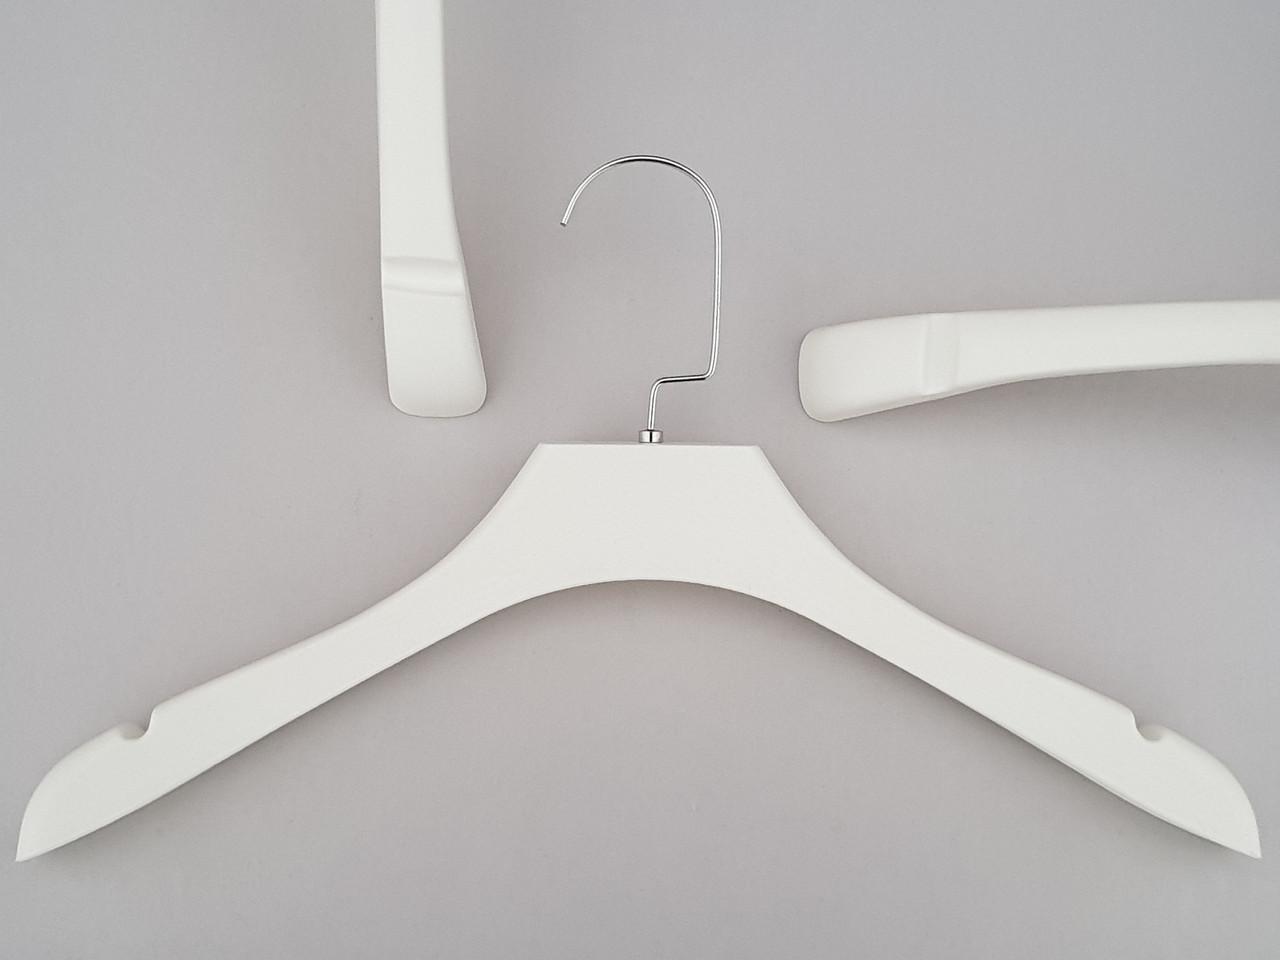 Плечики вешалки тремпеля  TZ0065 белого цвета под дерево, длина 39 см